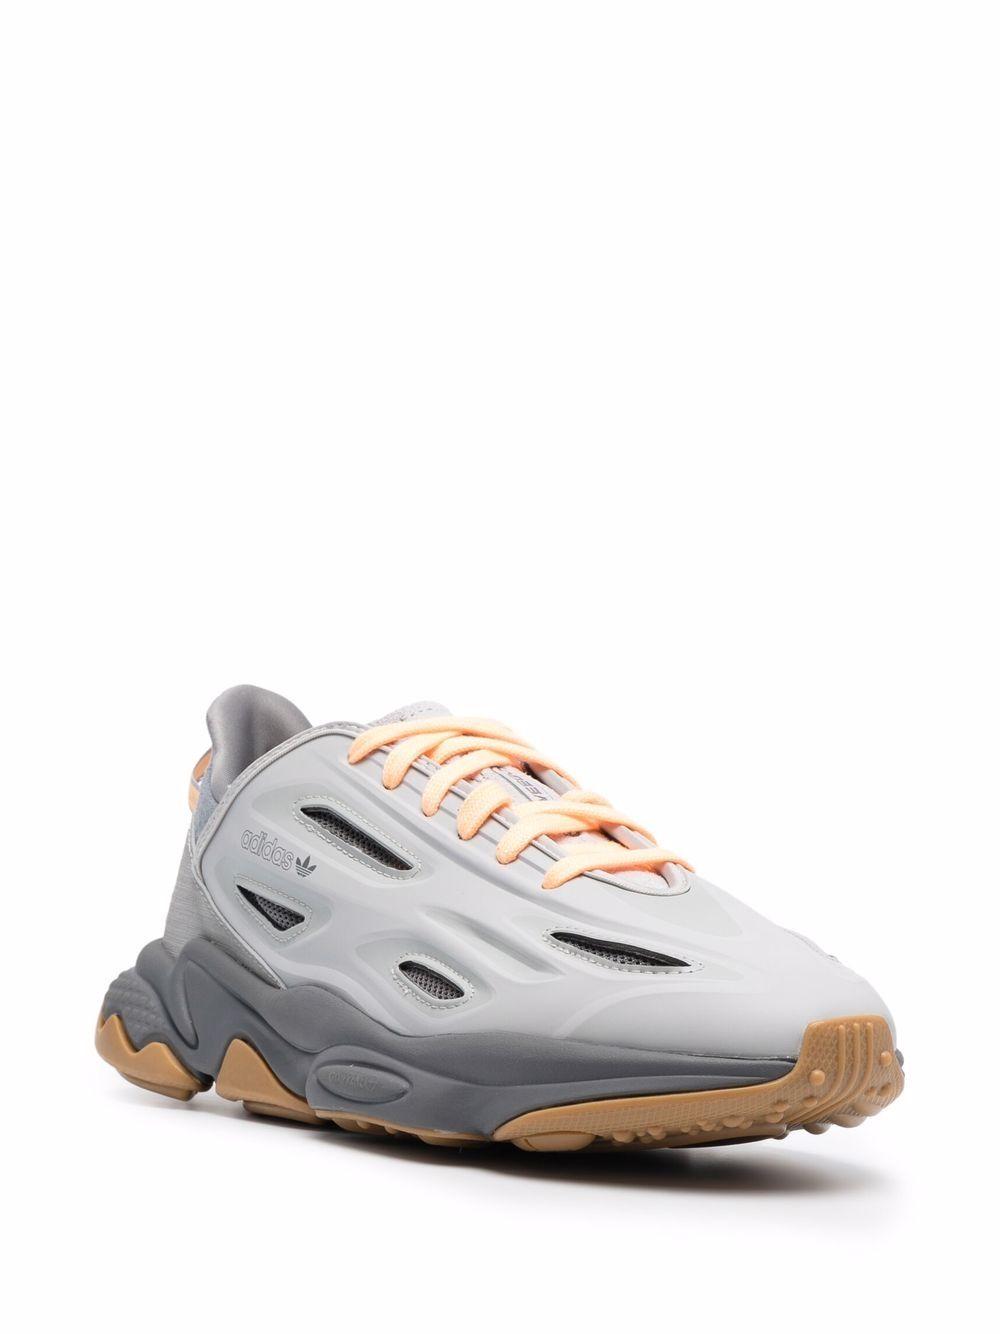 sneakers ozweego celox uomo grigie ADIDAS | Sneakers | H04234GREYTWO